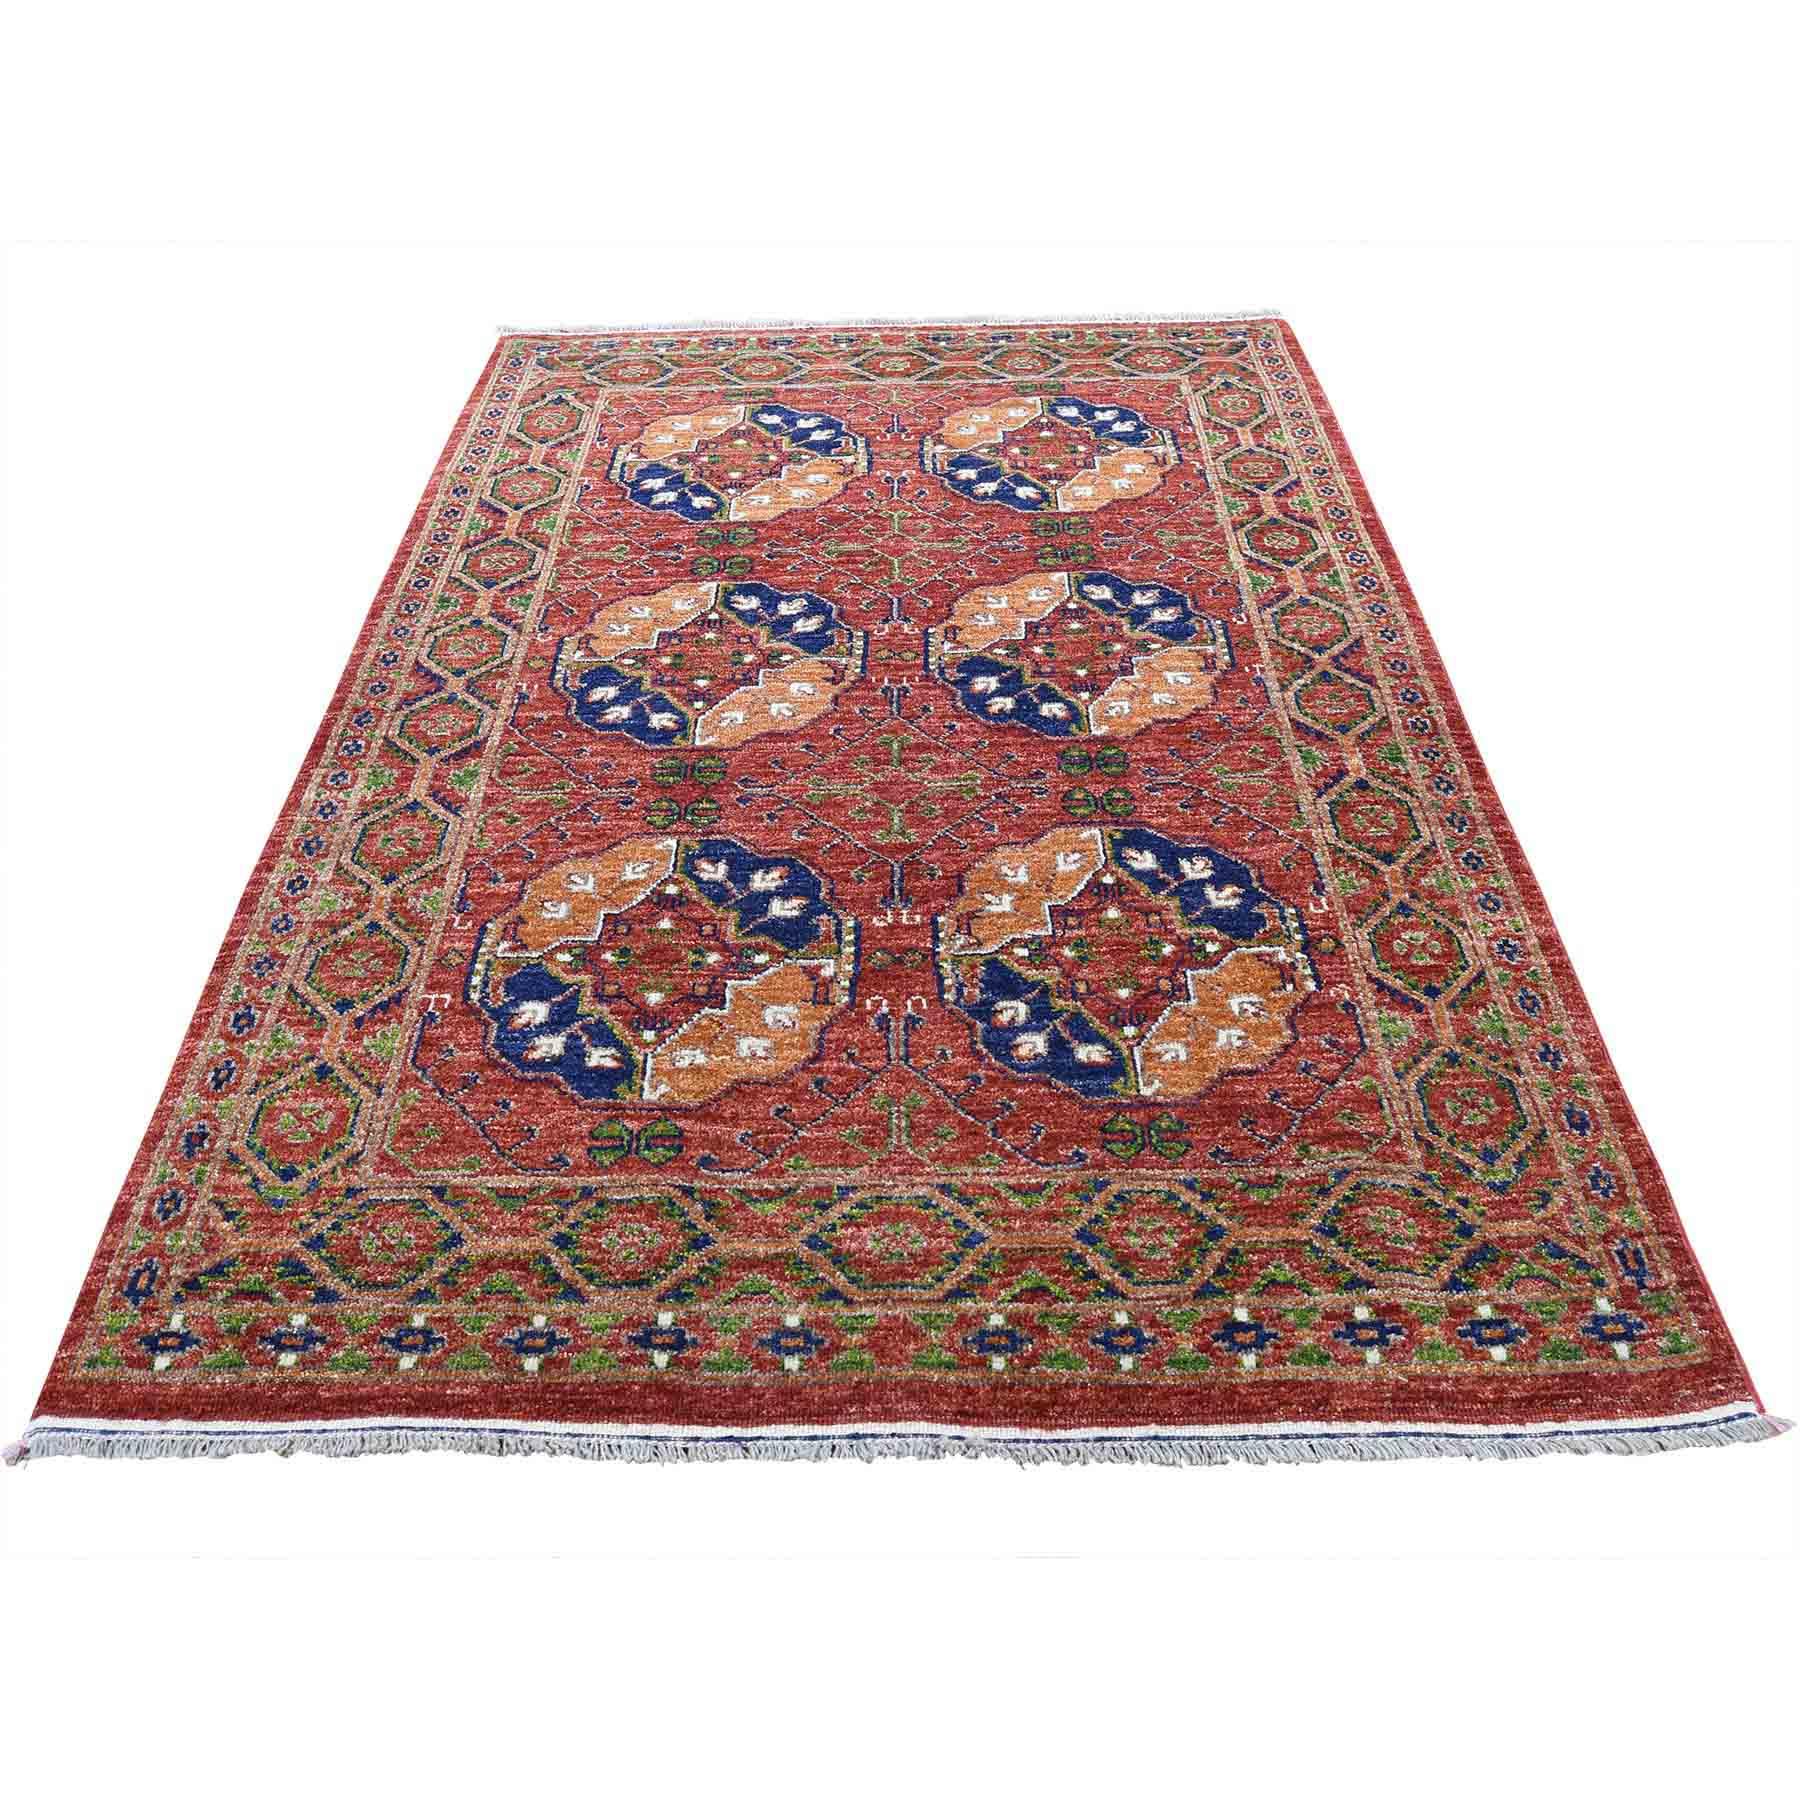 "4'1""X6'2"" Pure Wool Afghan Ersari Elephant Feet Design Hand-Knotted Oriental Rug moad08b7"